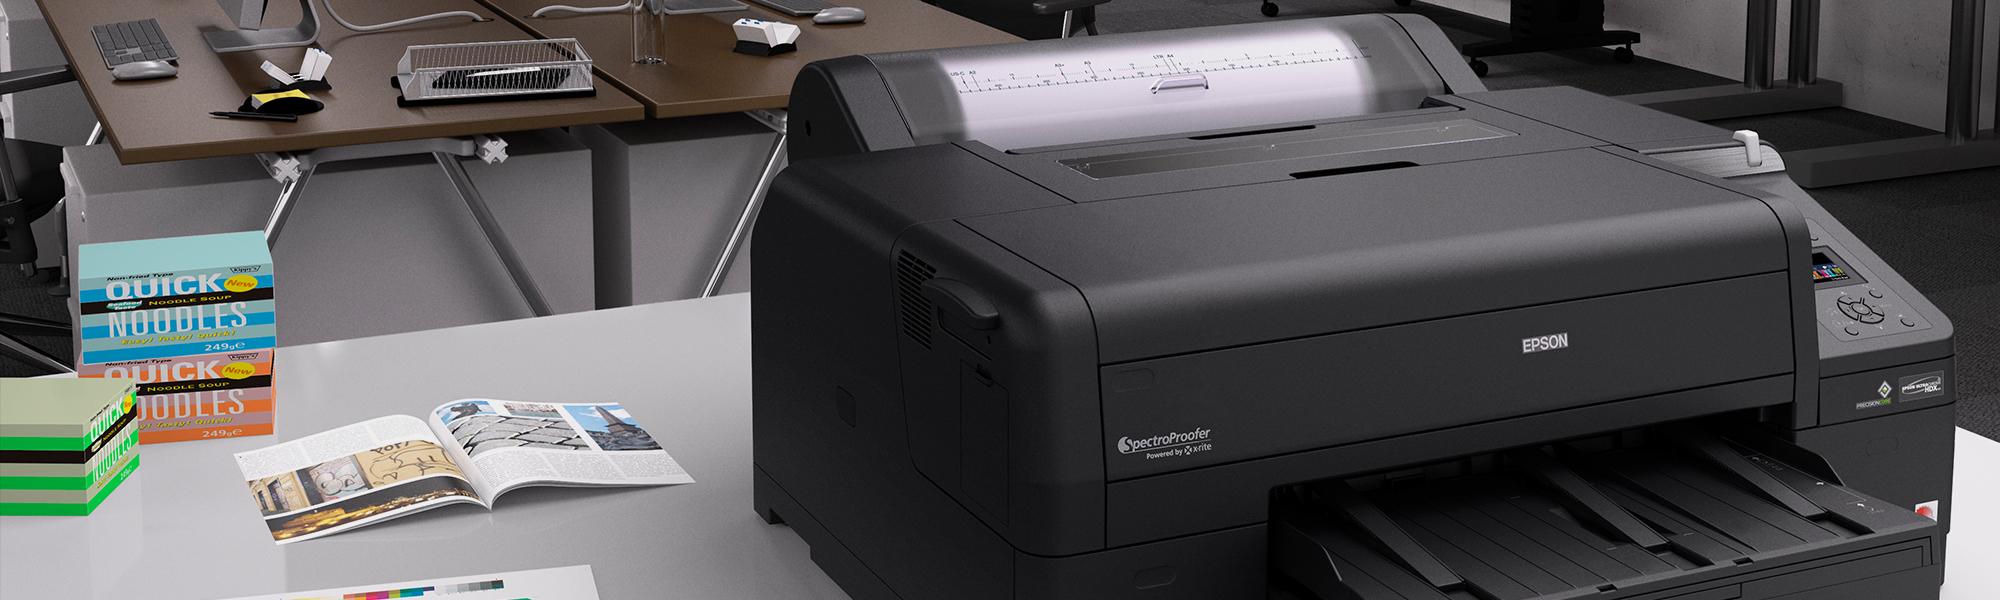 Epson SureColor SC-P5000 STD Farbe 2880 x 1440DPI A2 Tintenstrahldrucker